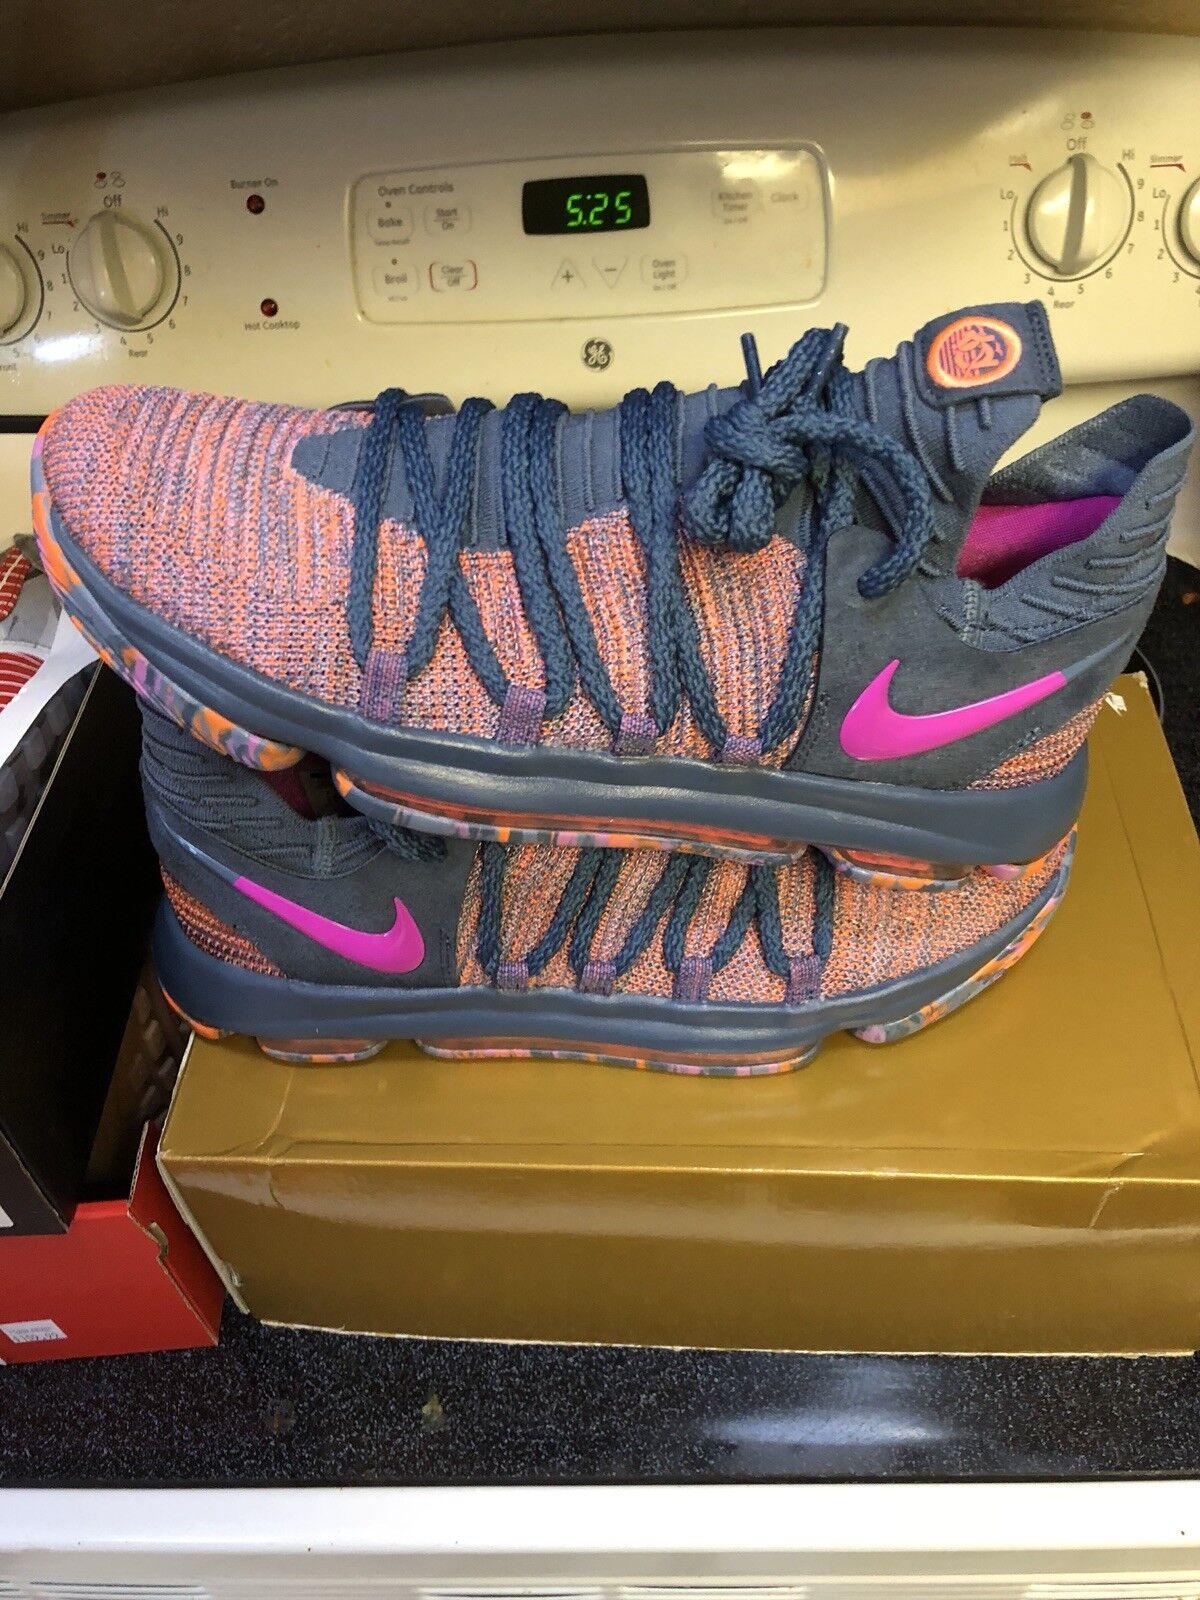 Nike Zoom KD10 KD10 KD10 LMTD AS All-Star Ocean Fog Fuchsia 897817-400 Size 11 Jordan 1 Xi 462231